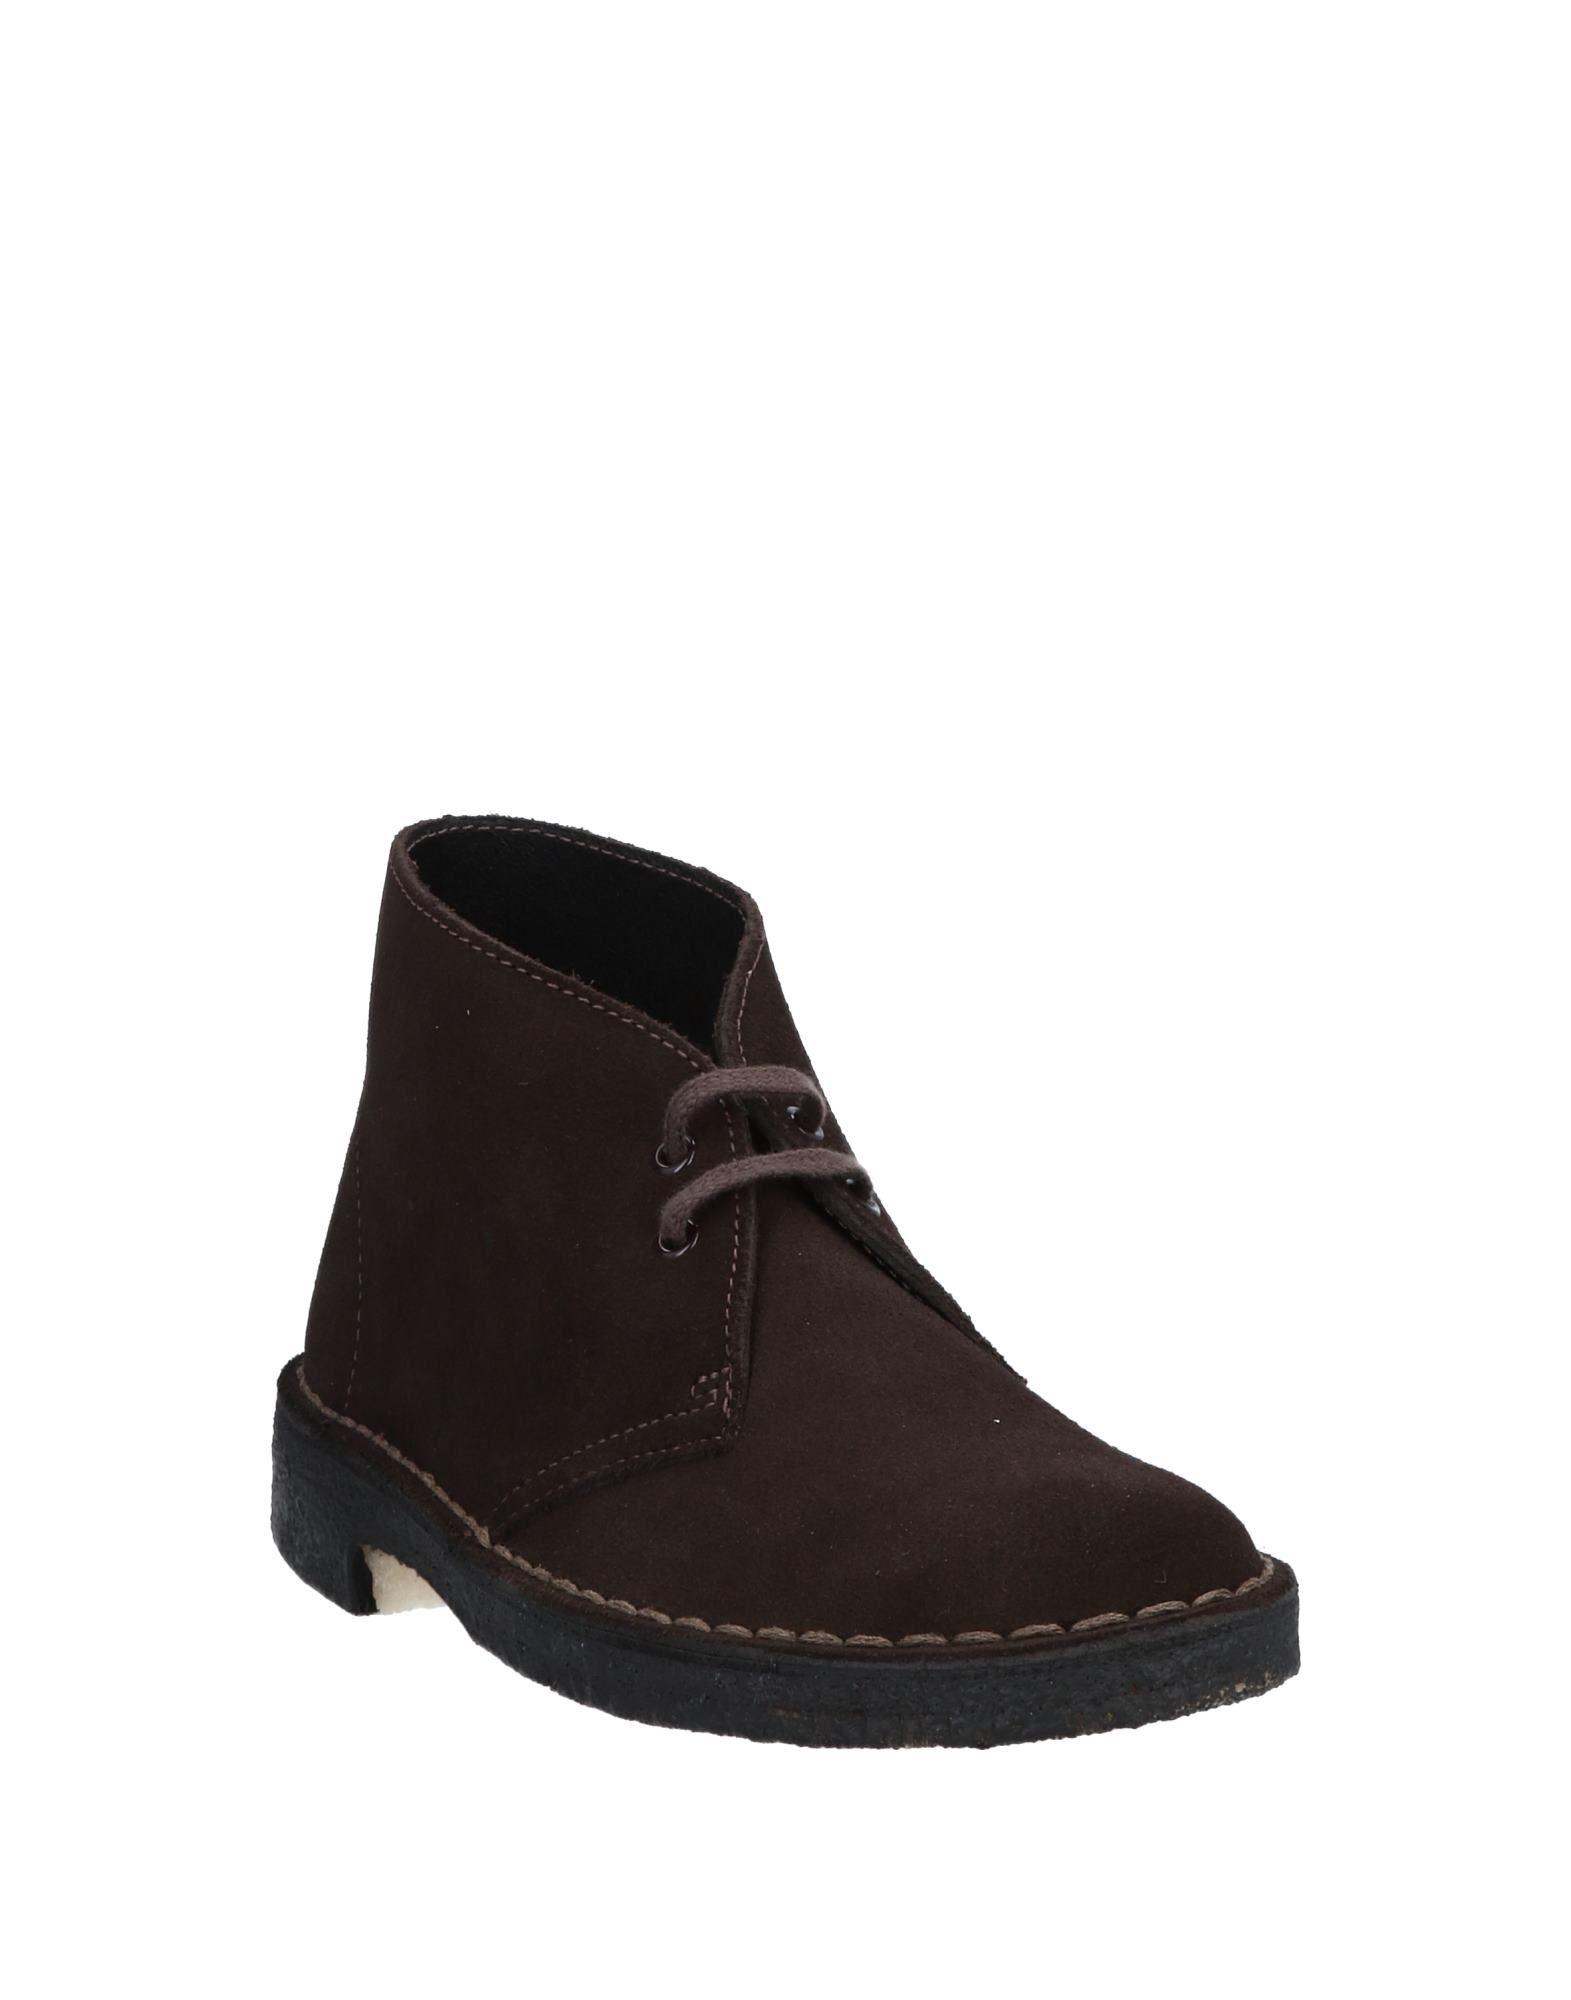 Clarks Originals Stiefelette Damen  Schuhe 11557343KX Gute Qualität beliebte Schuhe  bd4a1f